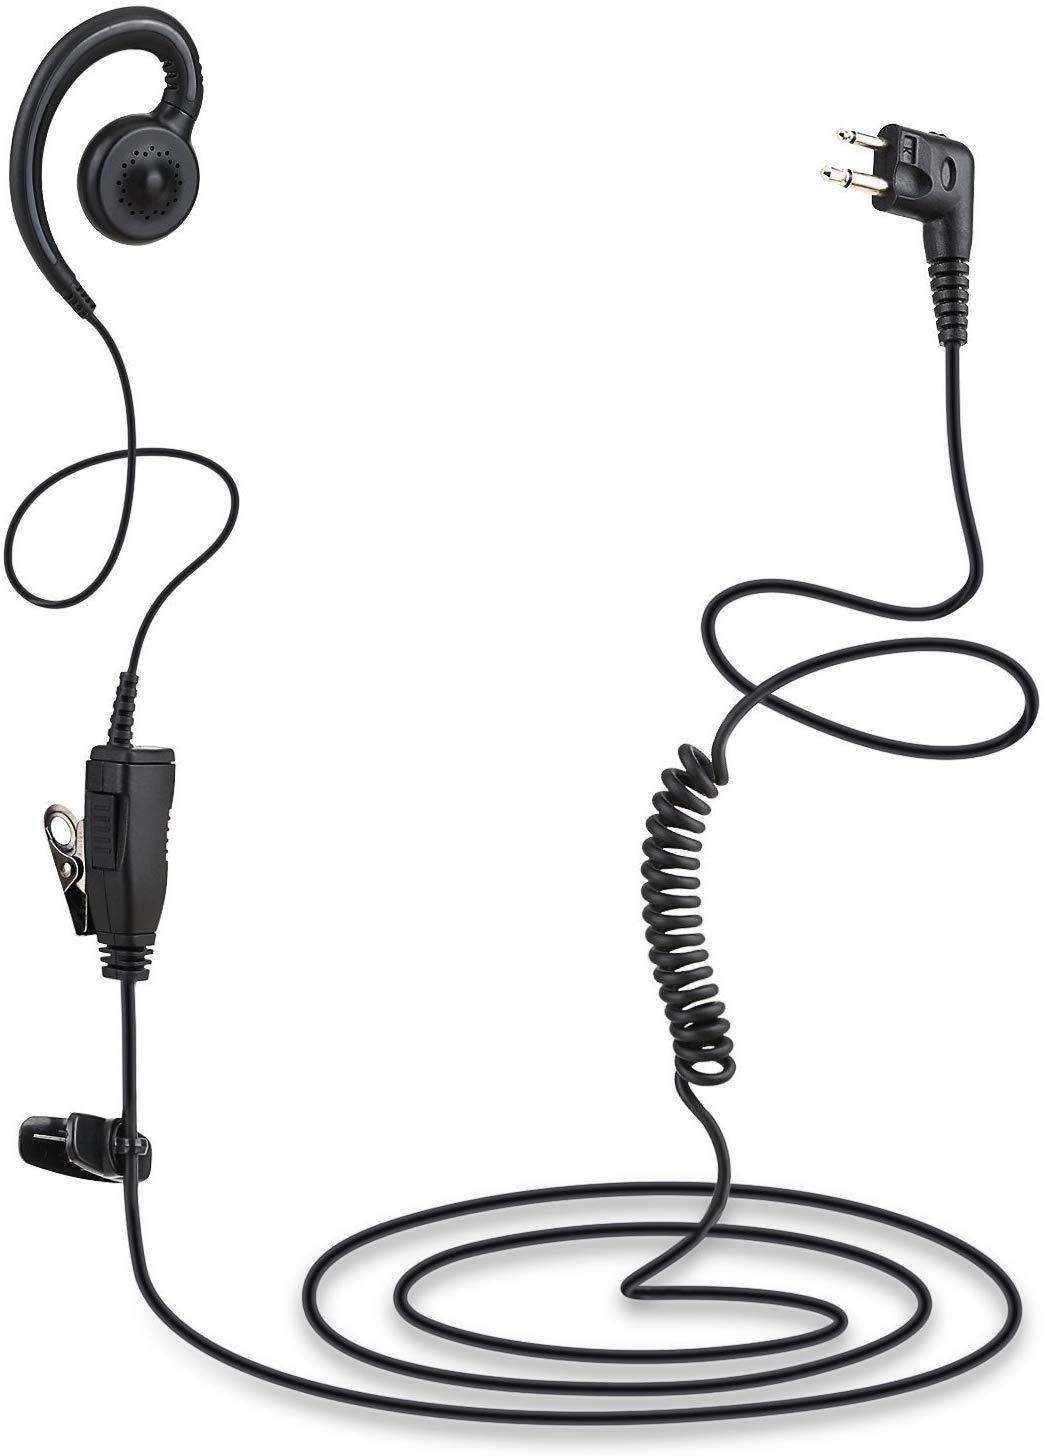 Swivel Earpiece with Microphone and PTT Kit for Motorola 2 Way Radio Walkie